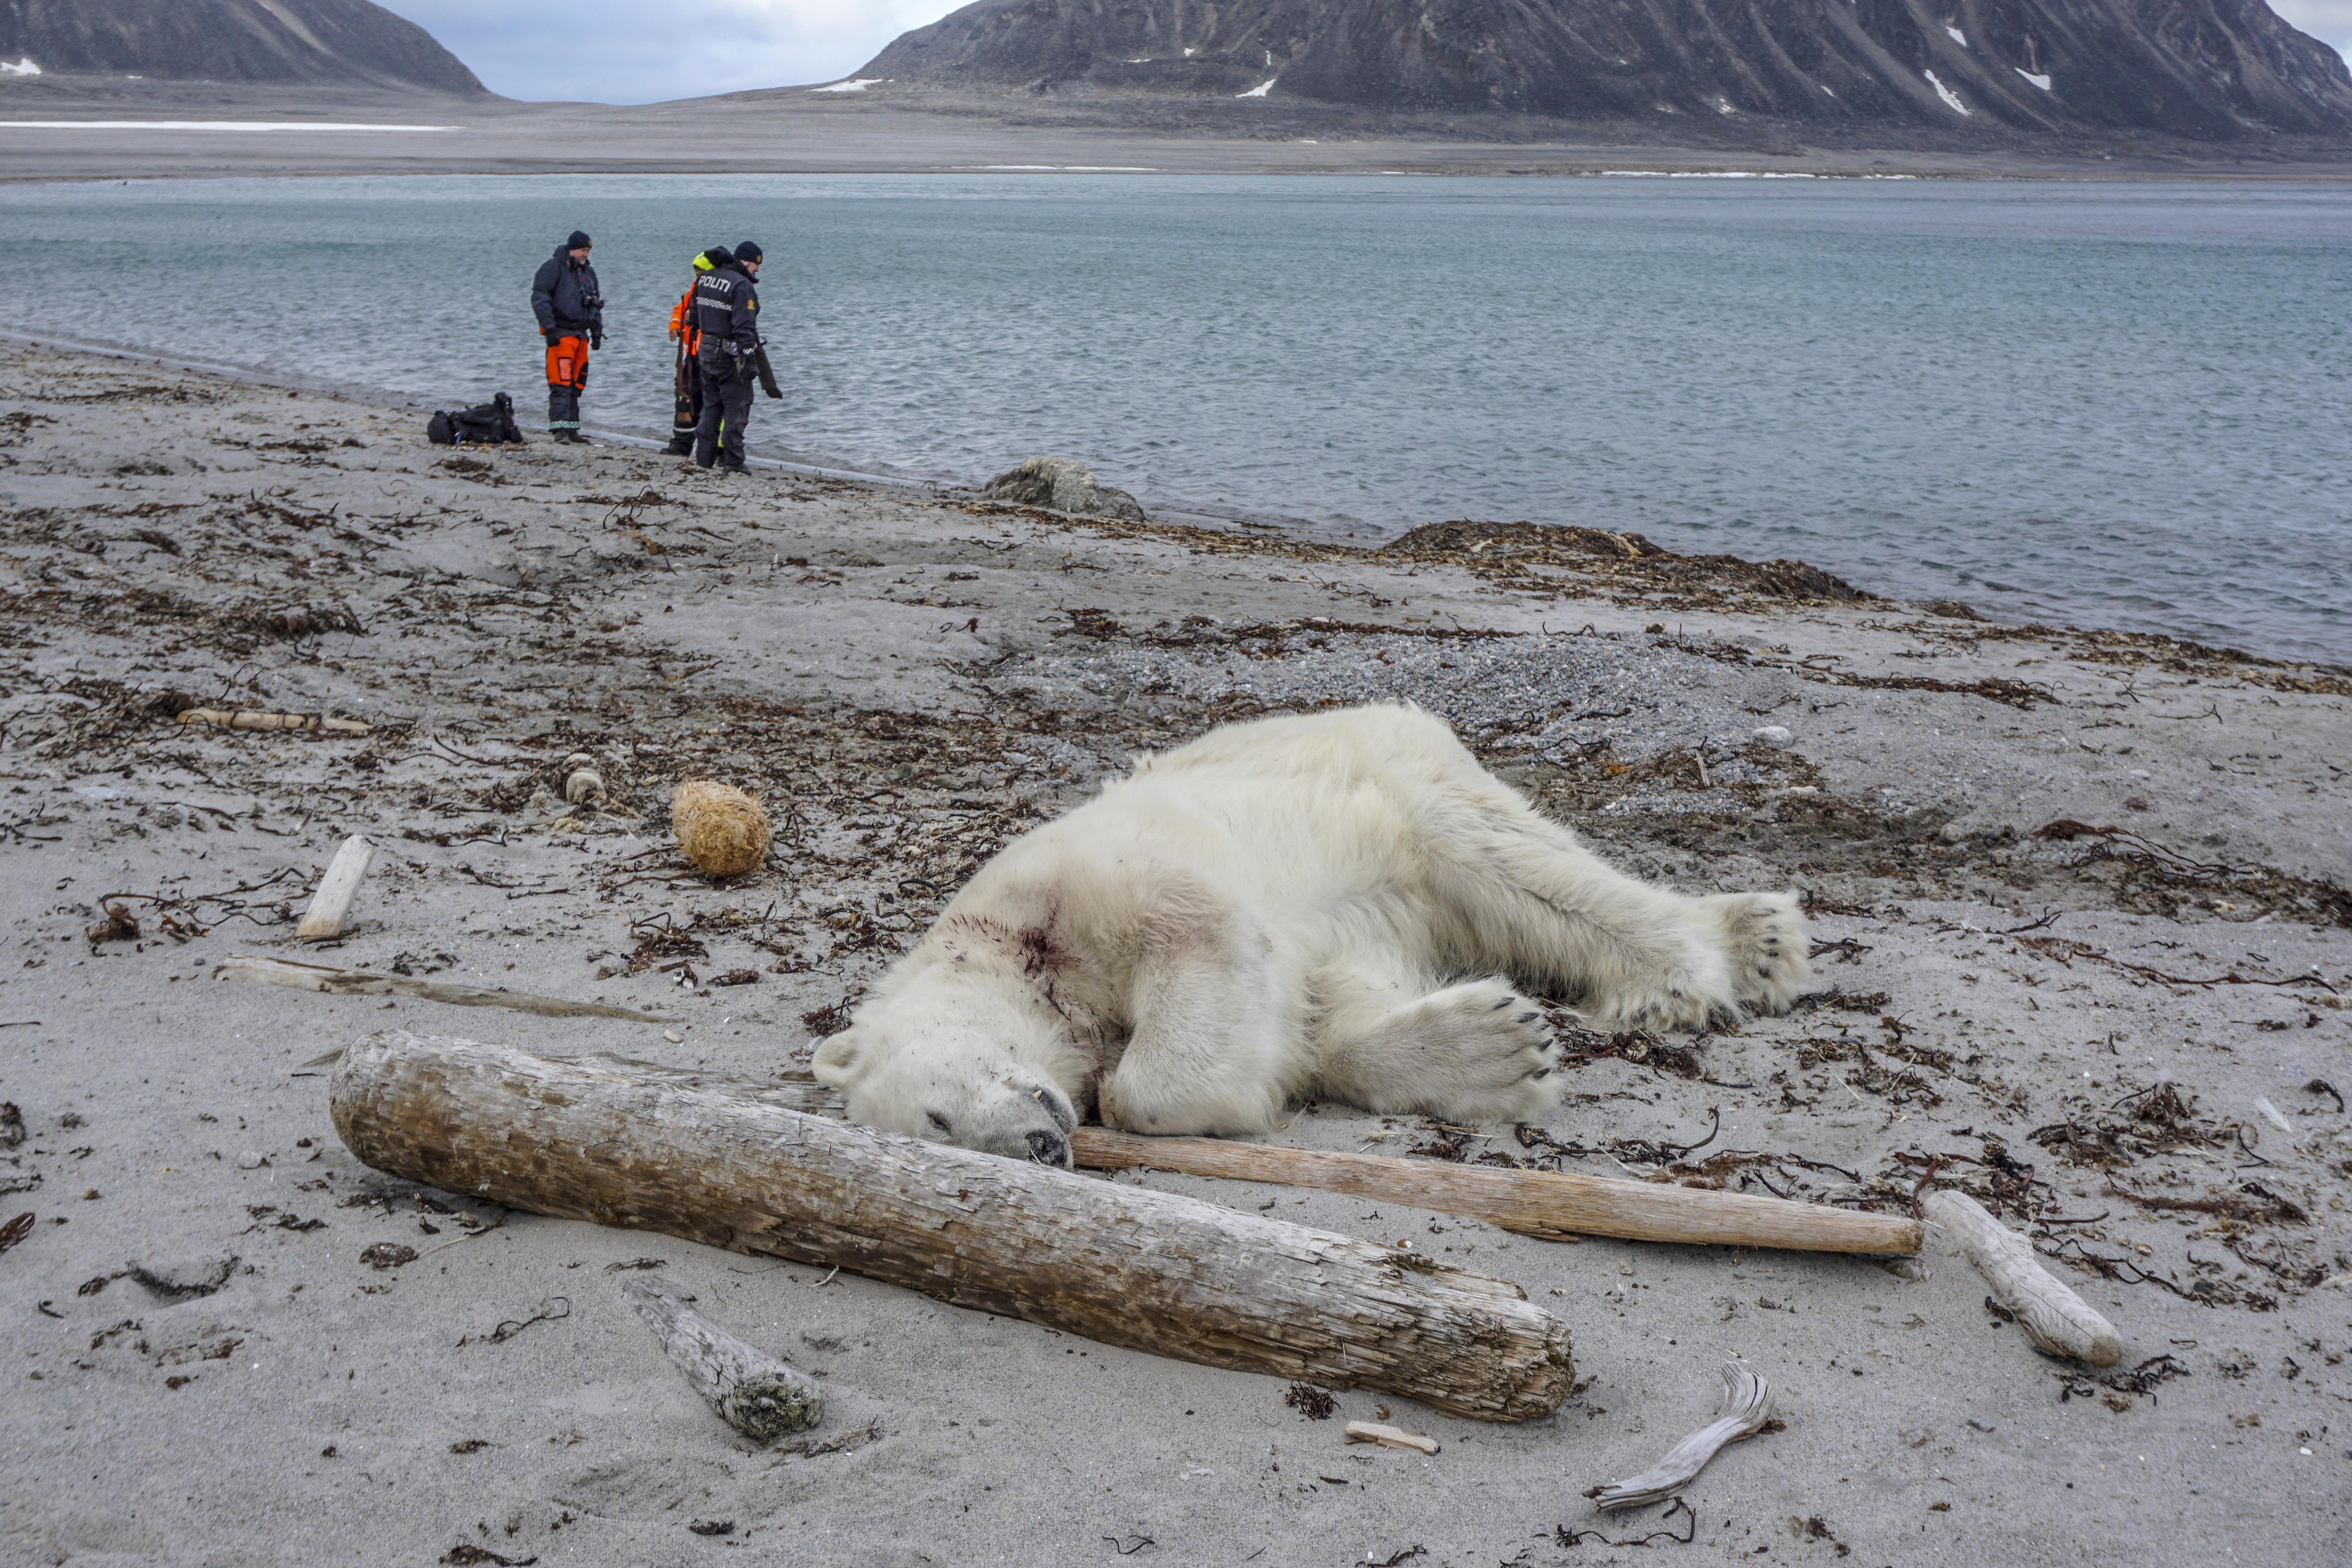 Cruise ship guards' killing of polar bear sparks international outrage